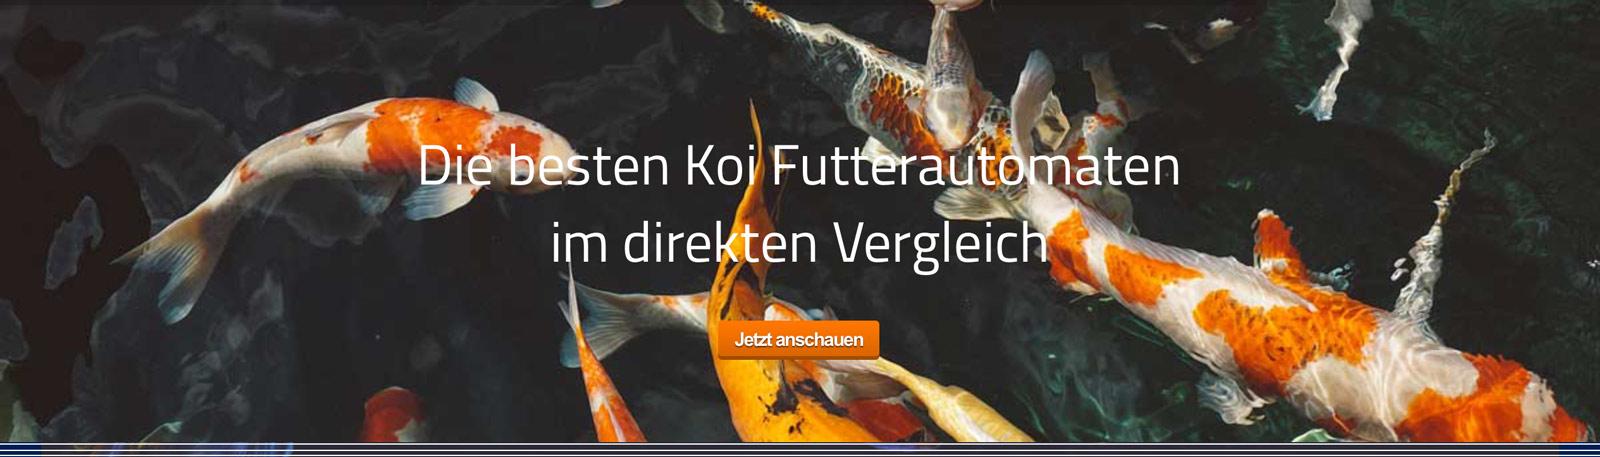 Koi-fuetterautomat-futter-teich